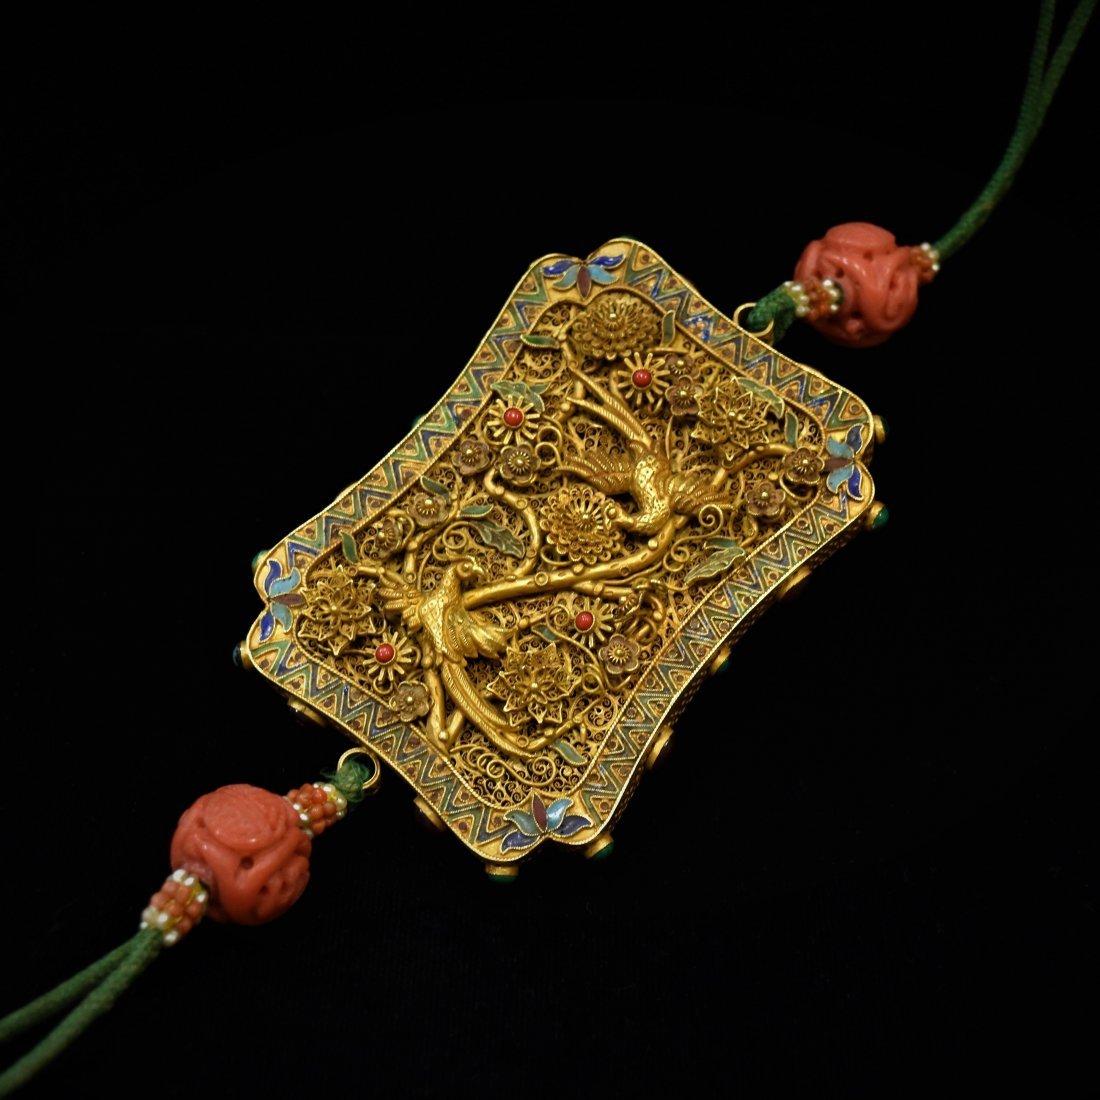 SOLID GOLD & ENAMEL INLAID PHOENIX AMULET